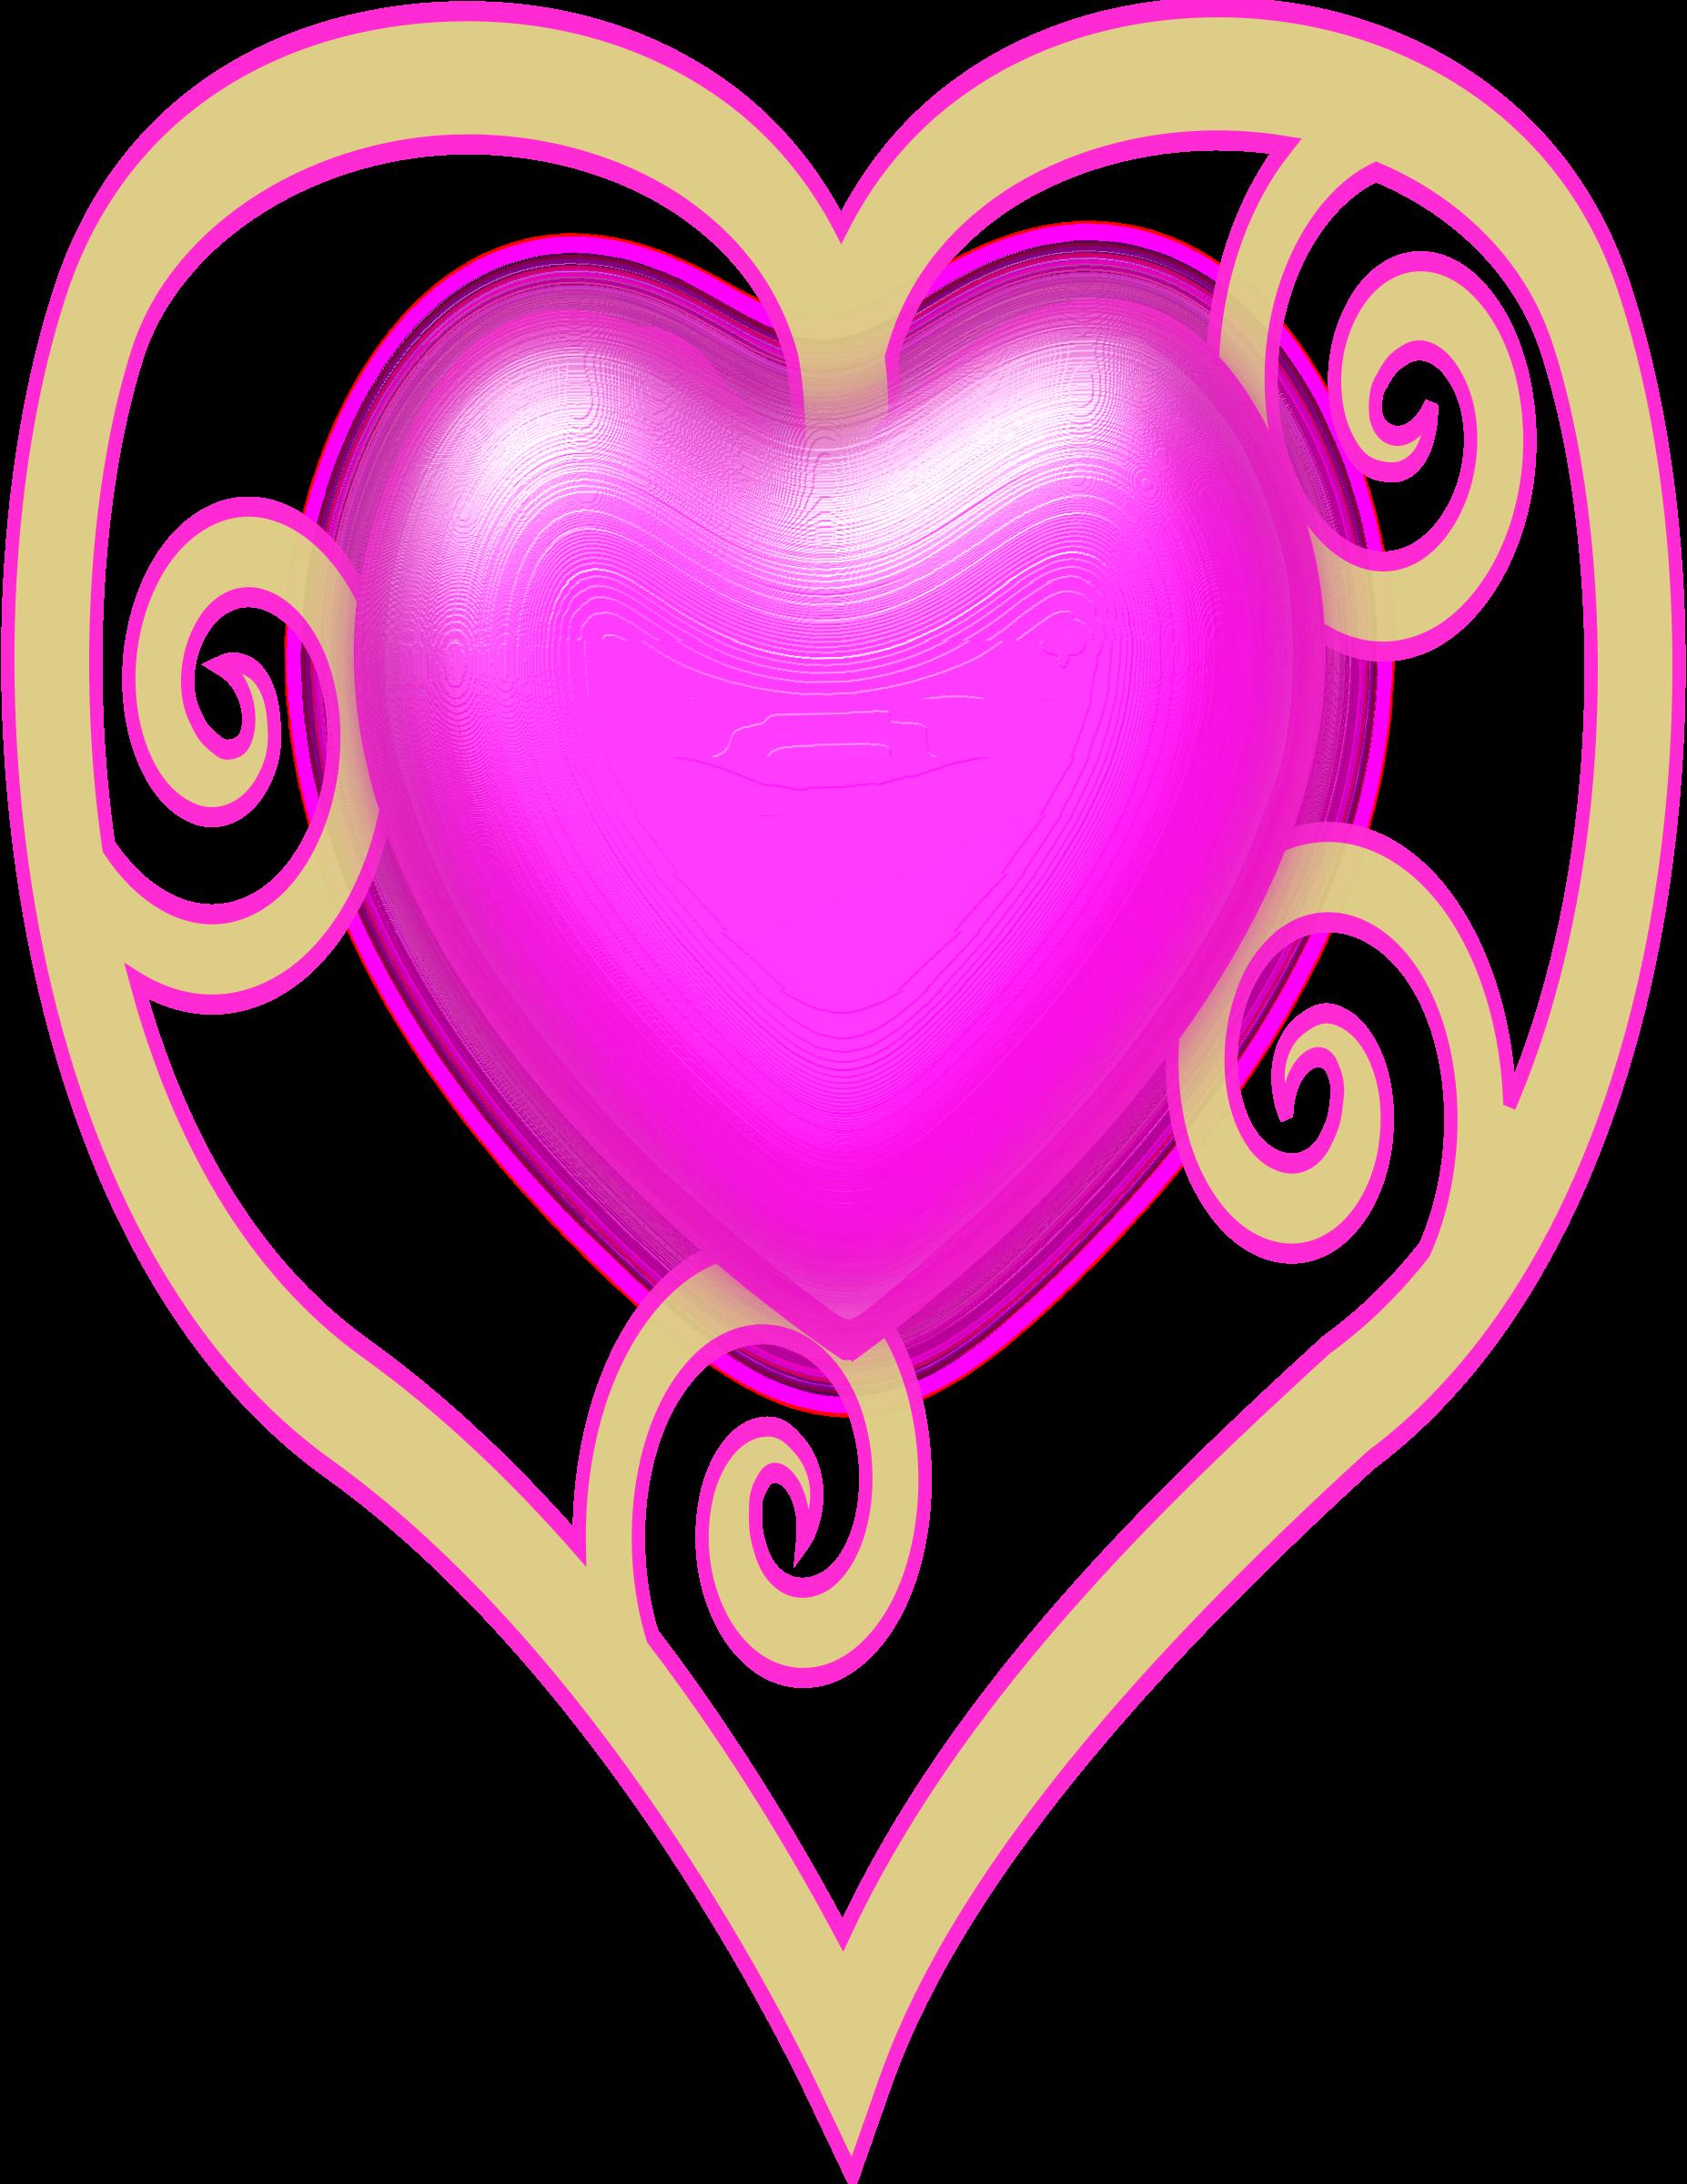 Princess crown big image. Heart clipart gem